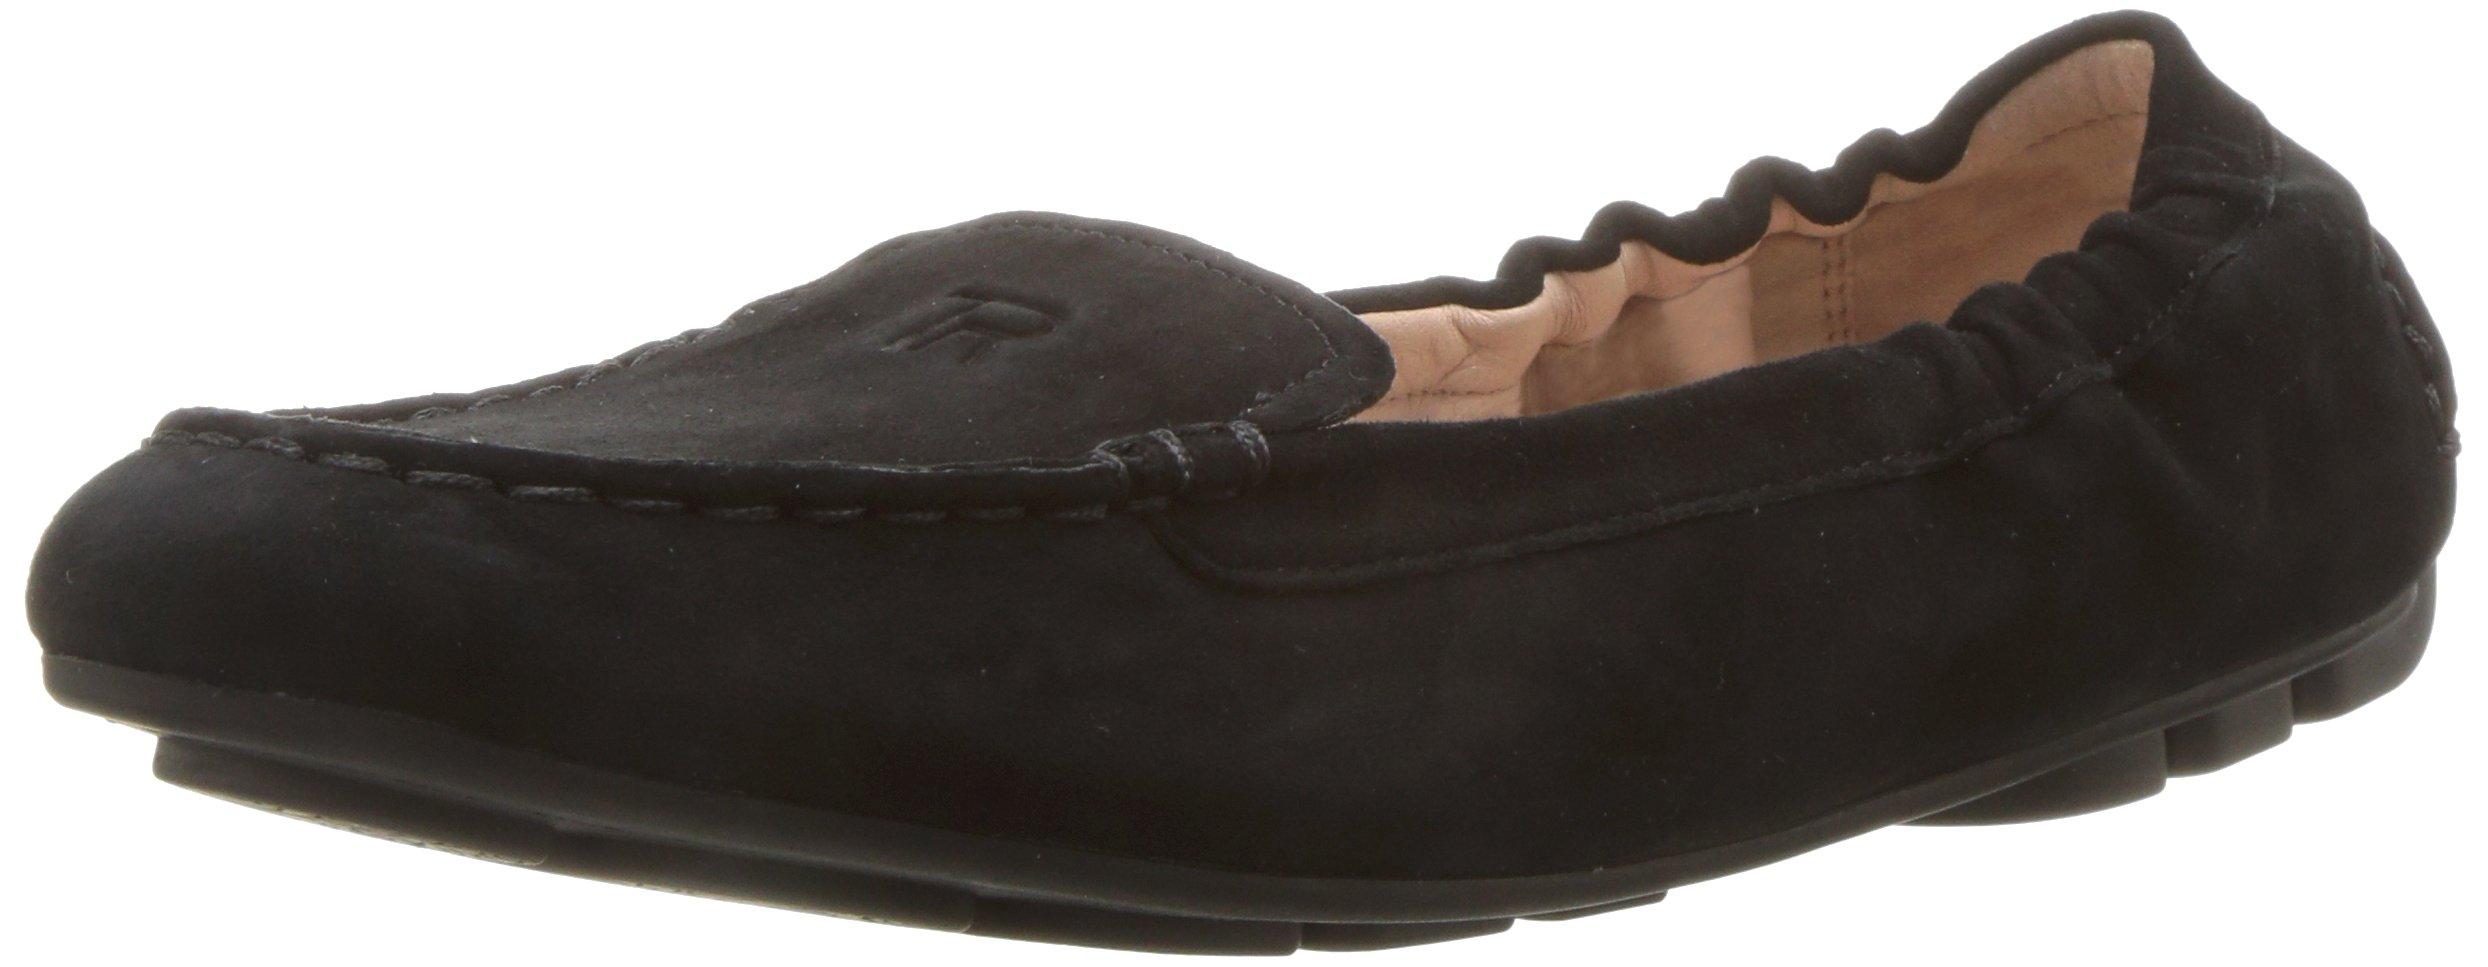 Taryn Rose Women's Kristine Driving Style Loafer